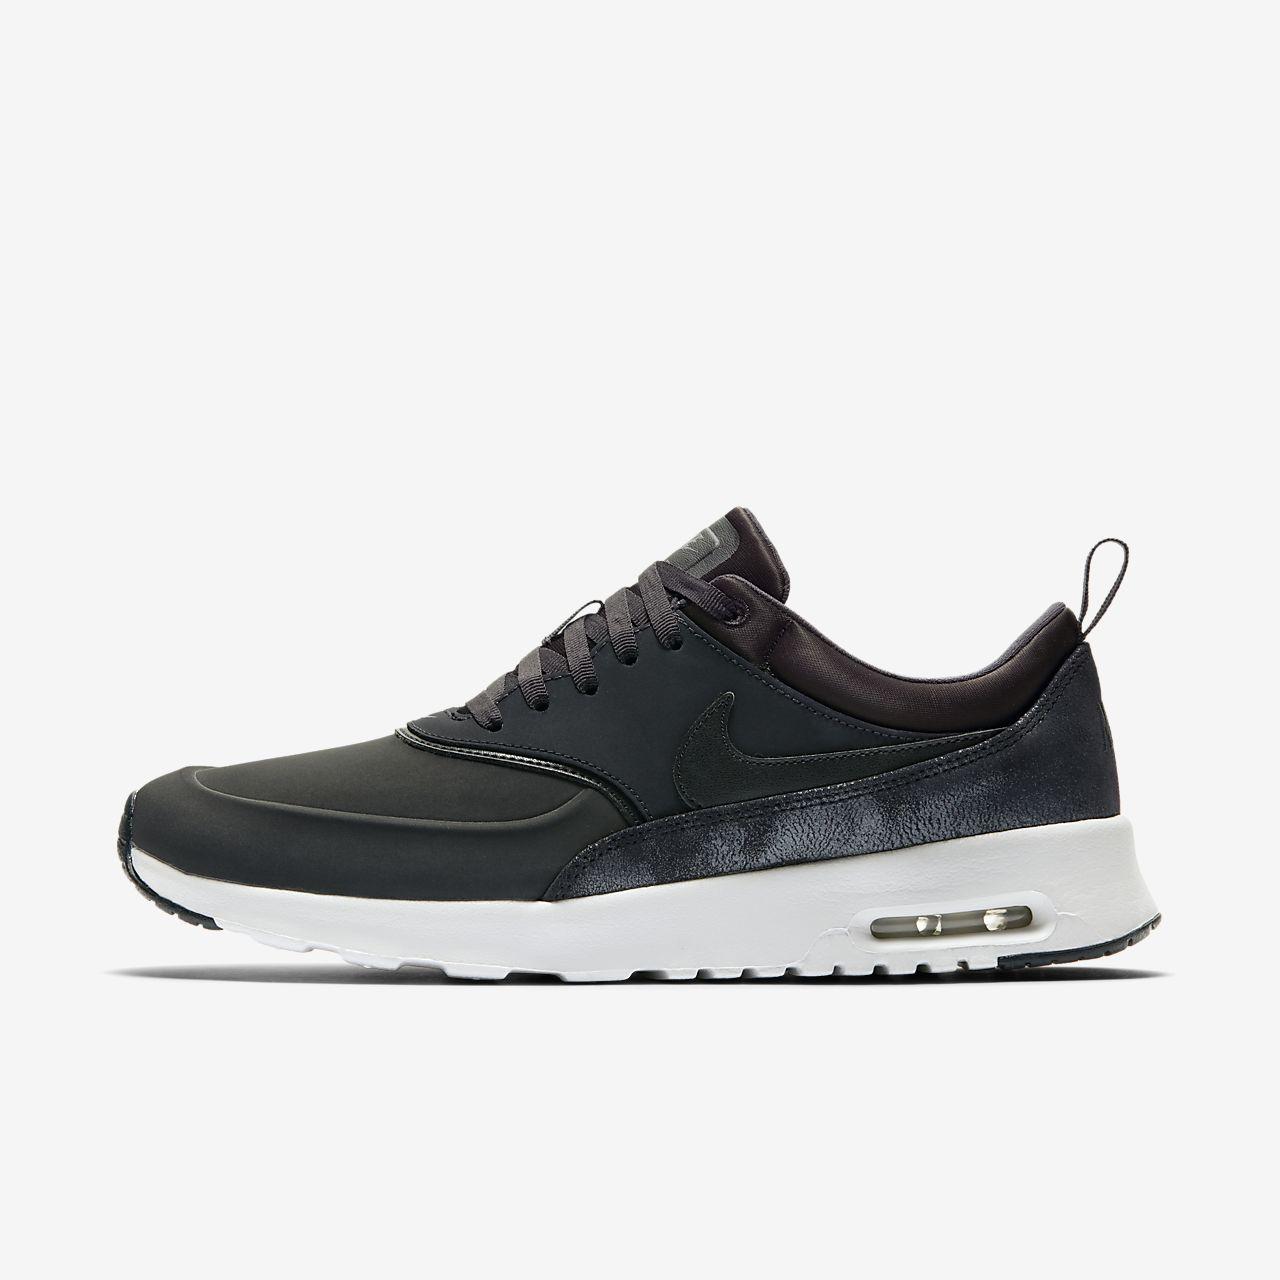 a963ef7f53171 Nike Air Max Thea Premium Women s Shoe. Nike.com GB